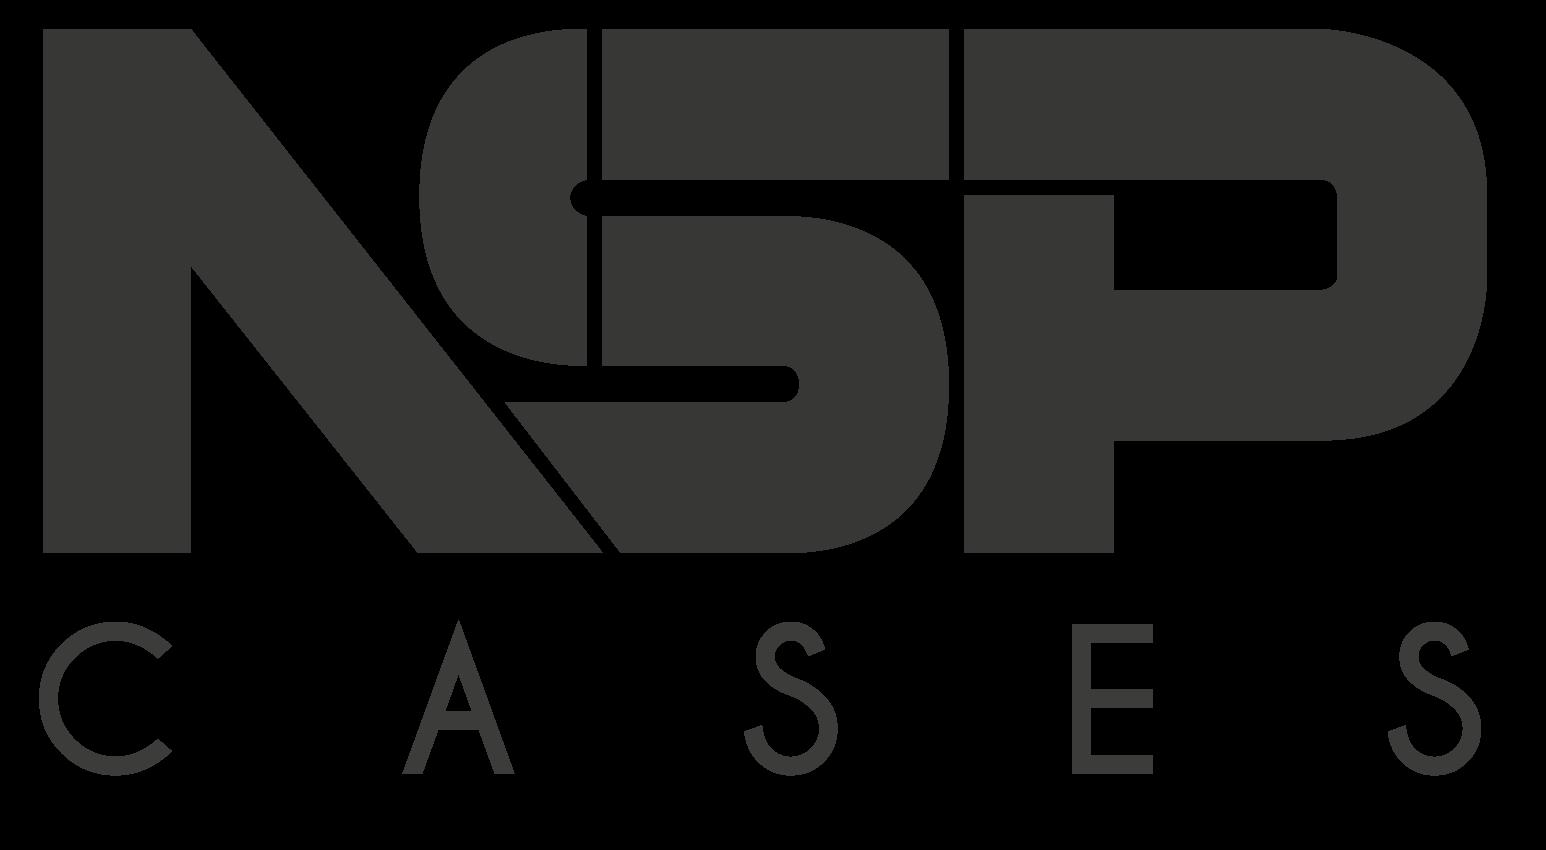 NSP Cases Ltd